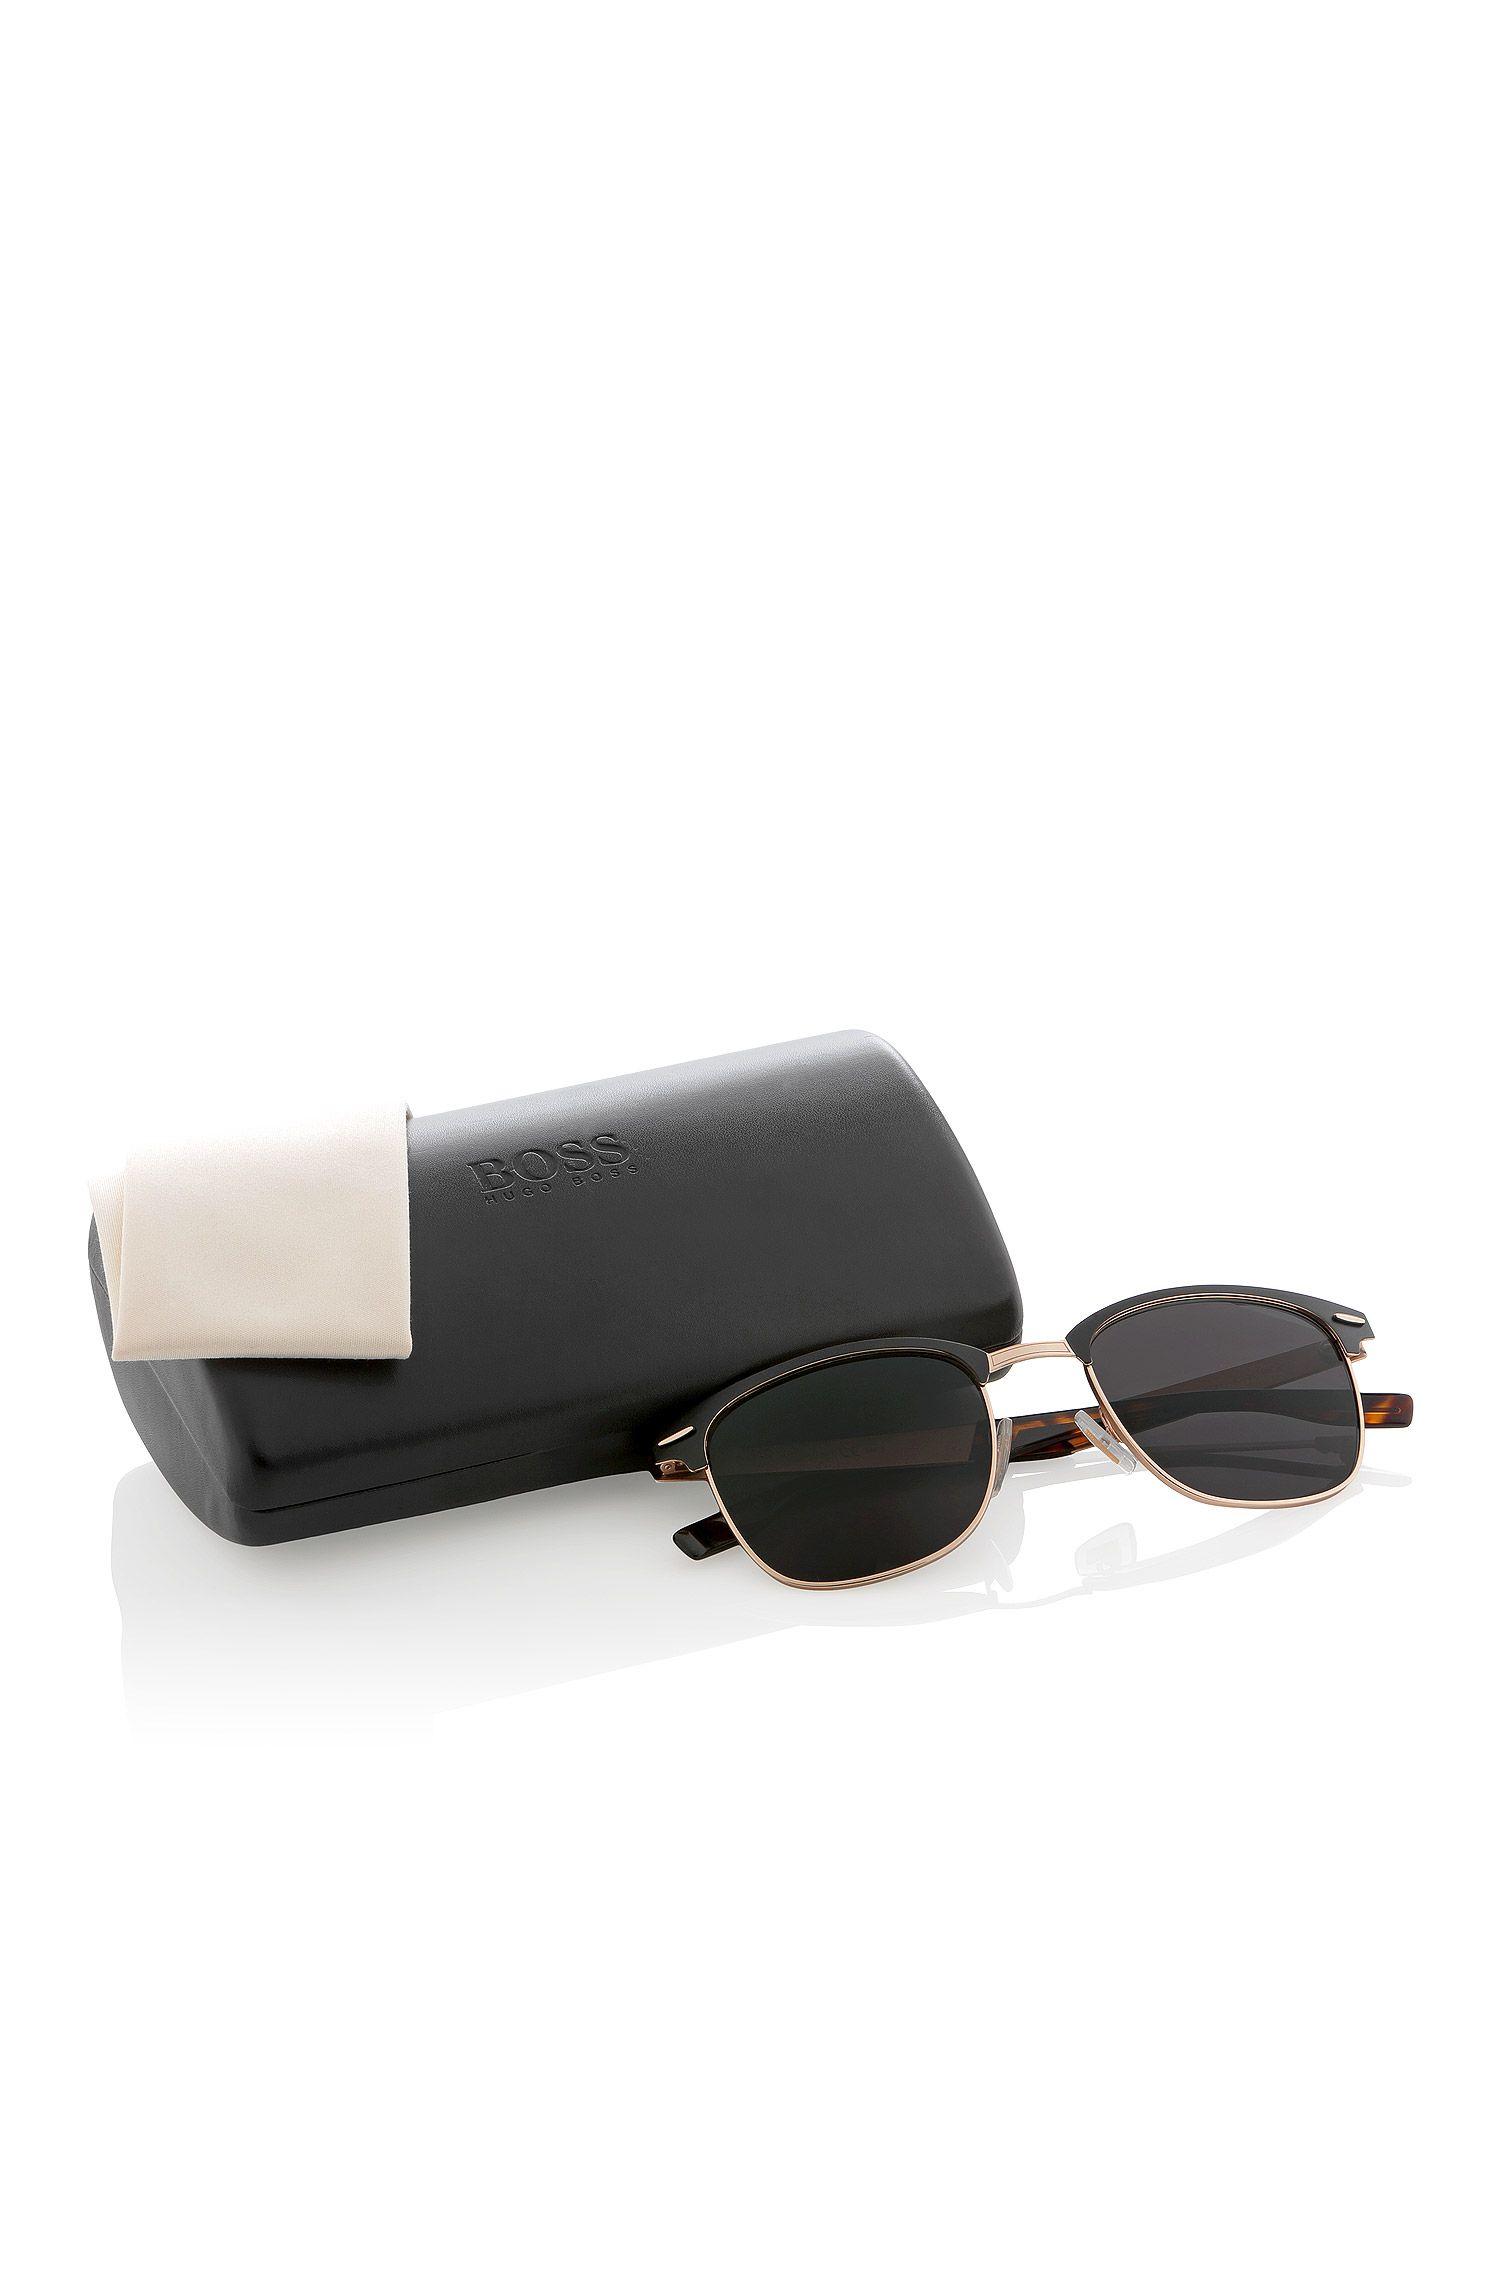 Sonnenbrille ´BOSS 0595/S`